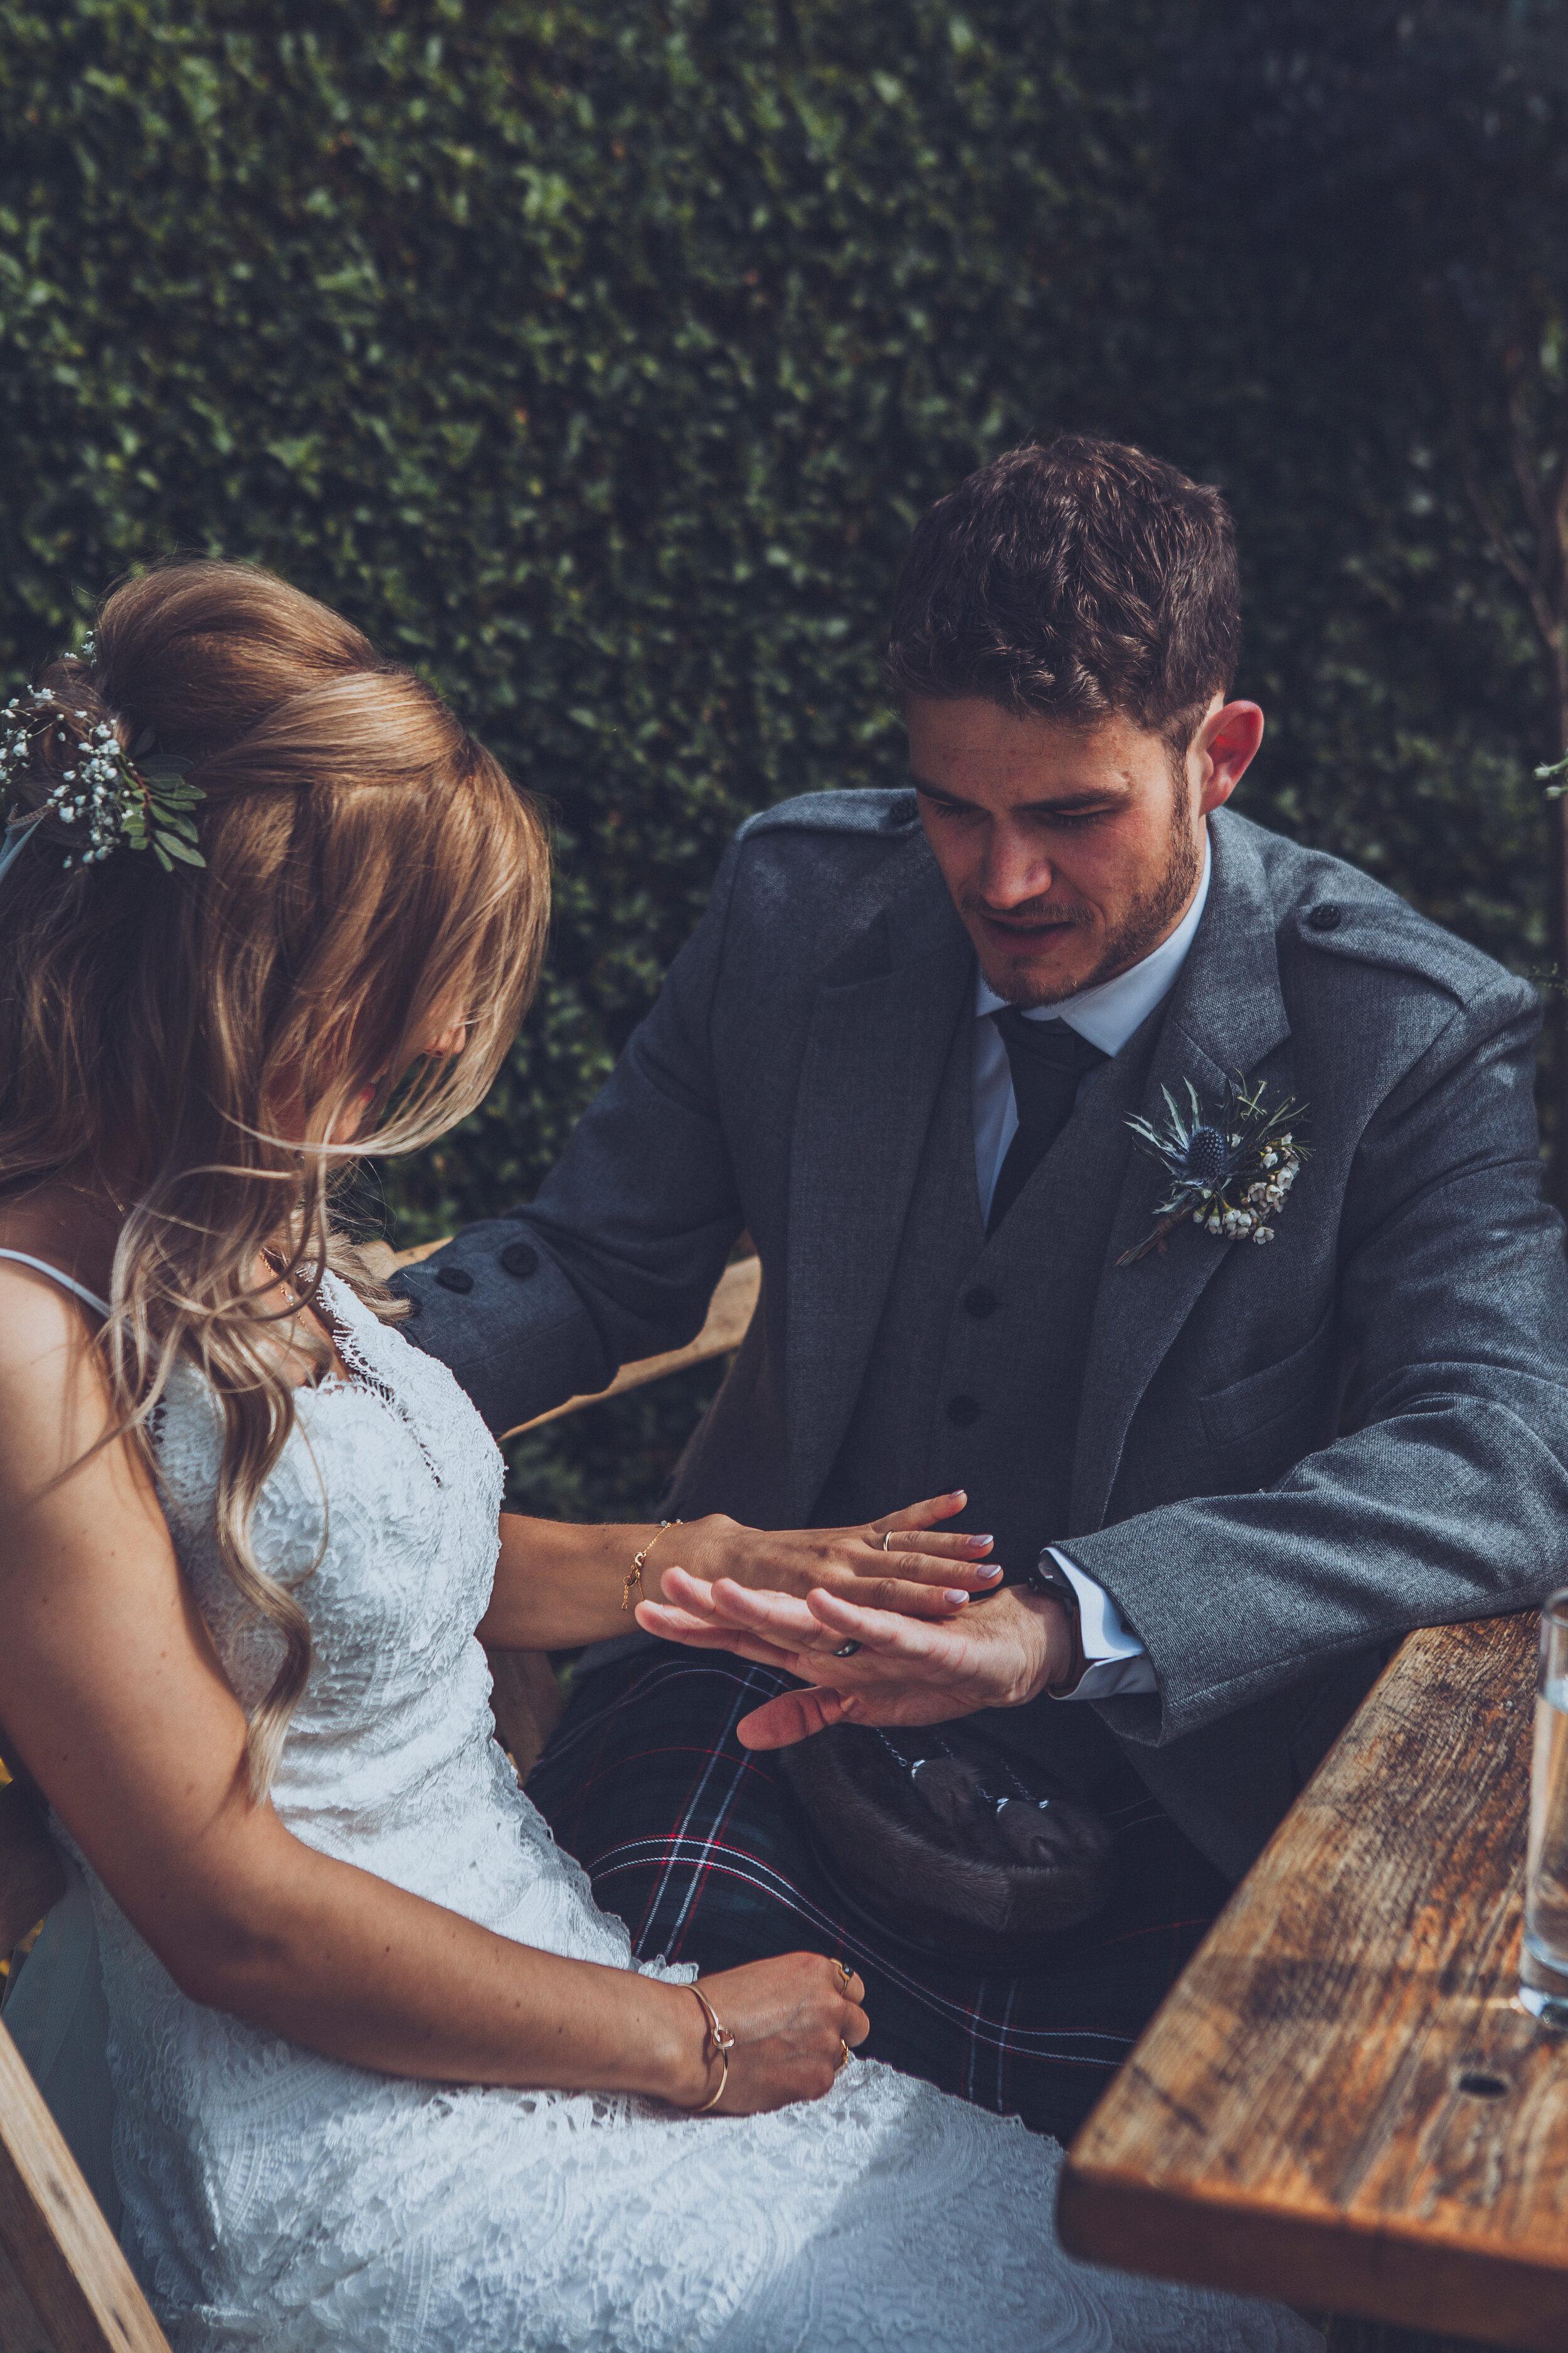 Dalduff Farm Ayrshire Wedding Photography - Claire Basiuk Photographer - 11.jpg